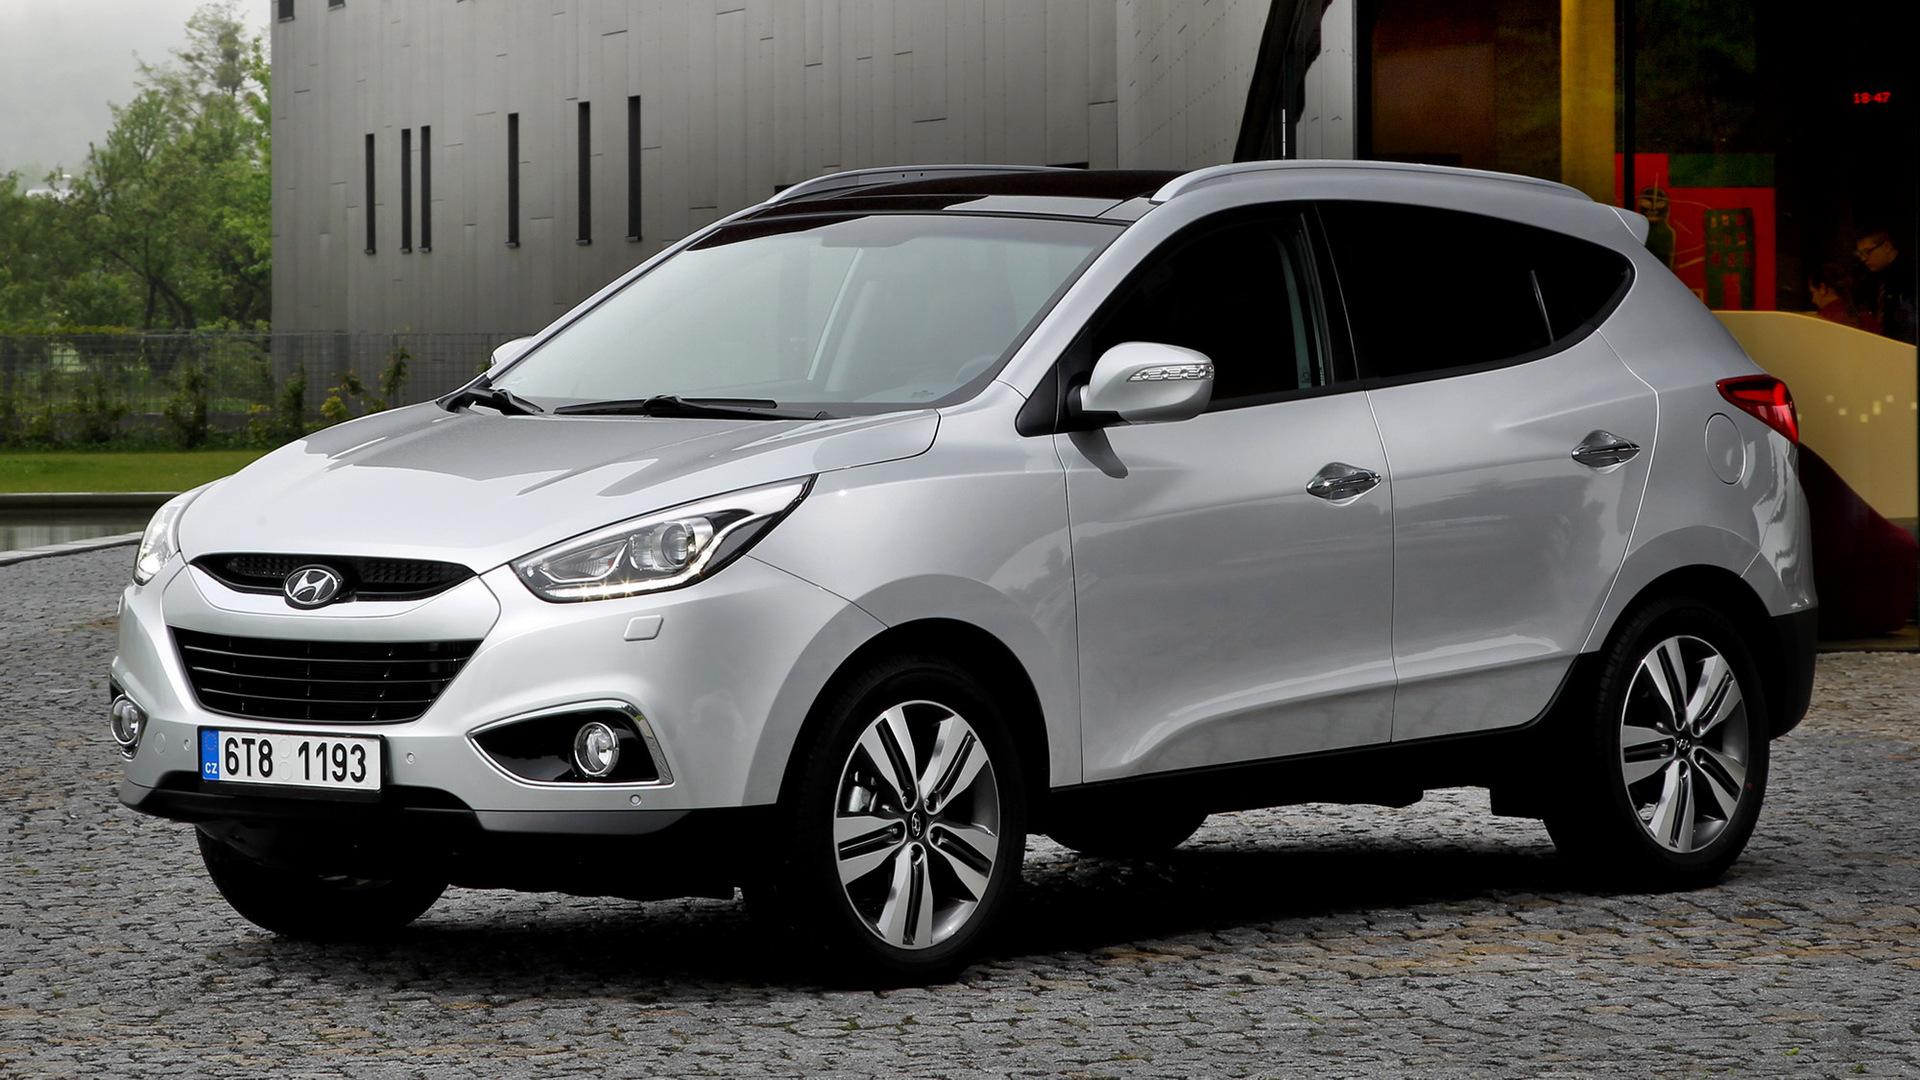 2013 Hyundai ix35   Wallpapers and HD Images Car Pixel 1920x1080